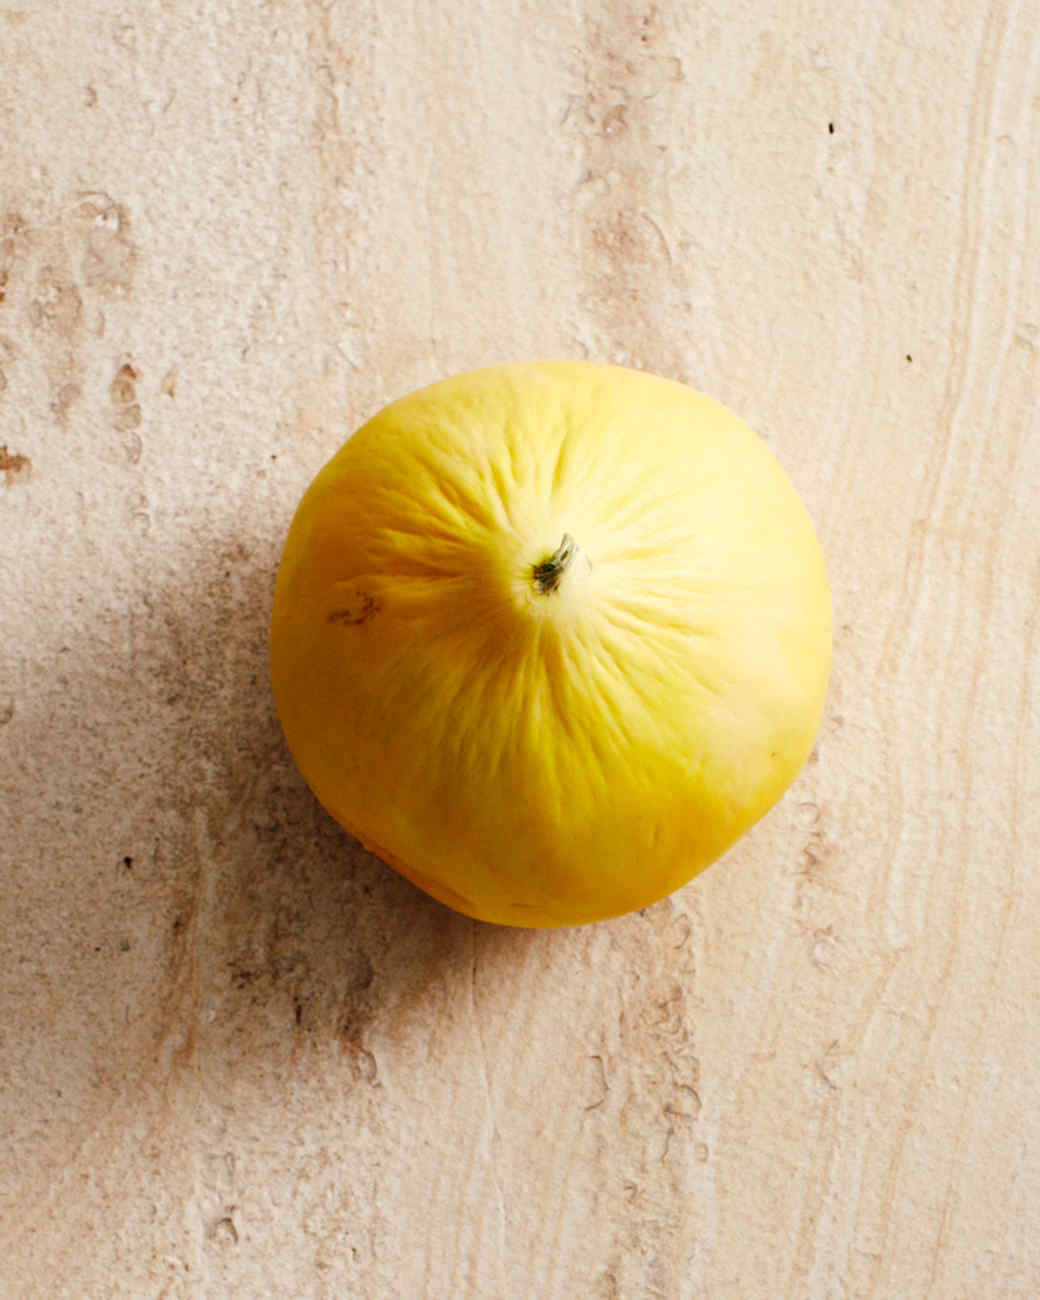 melon-ipad-cranshaw-0185-ld110630-0614.jpg